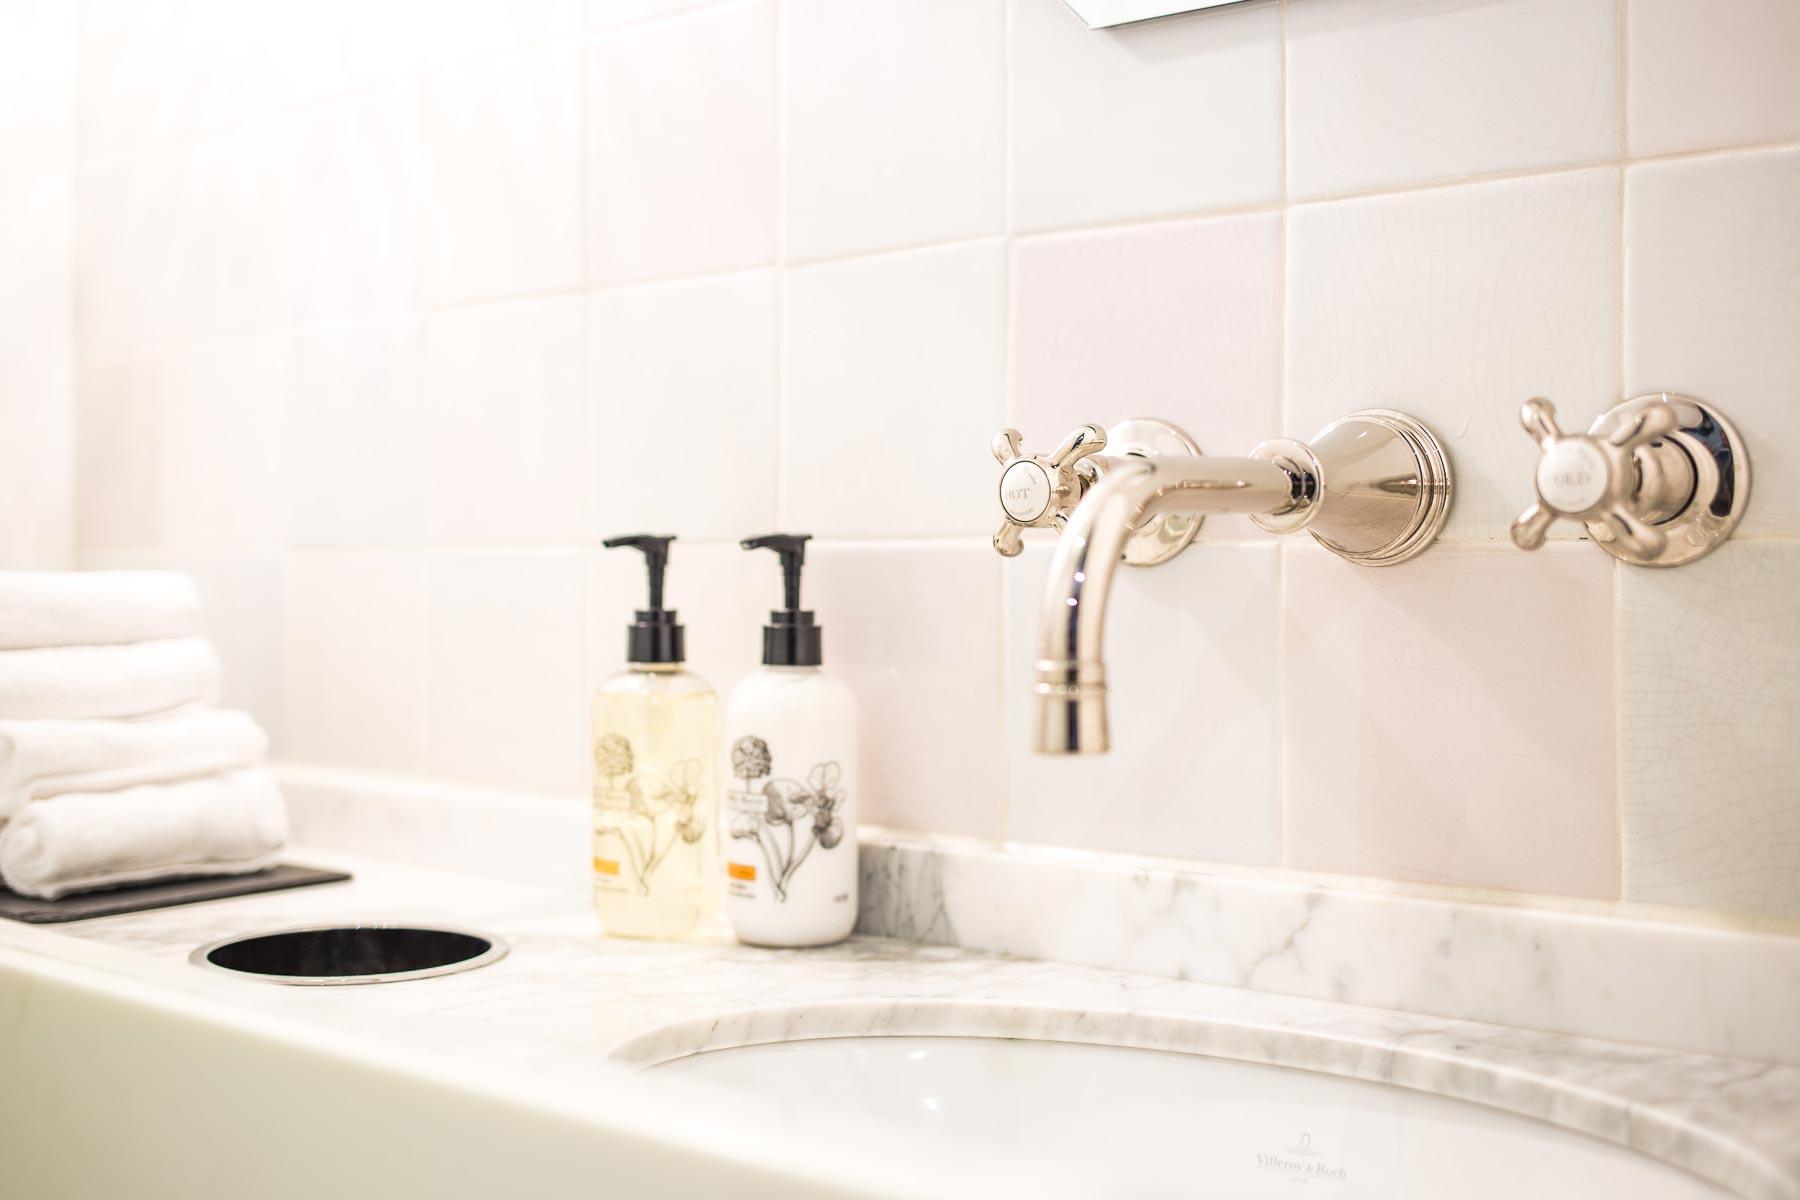 Rustiek Vintage Badkamer : Landelijke badkamers keukens toiletten taps baths